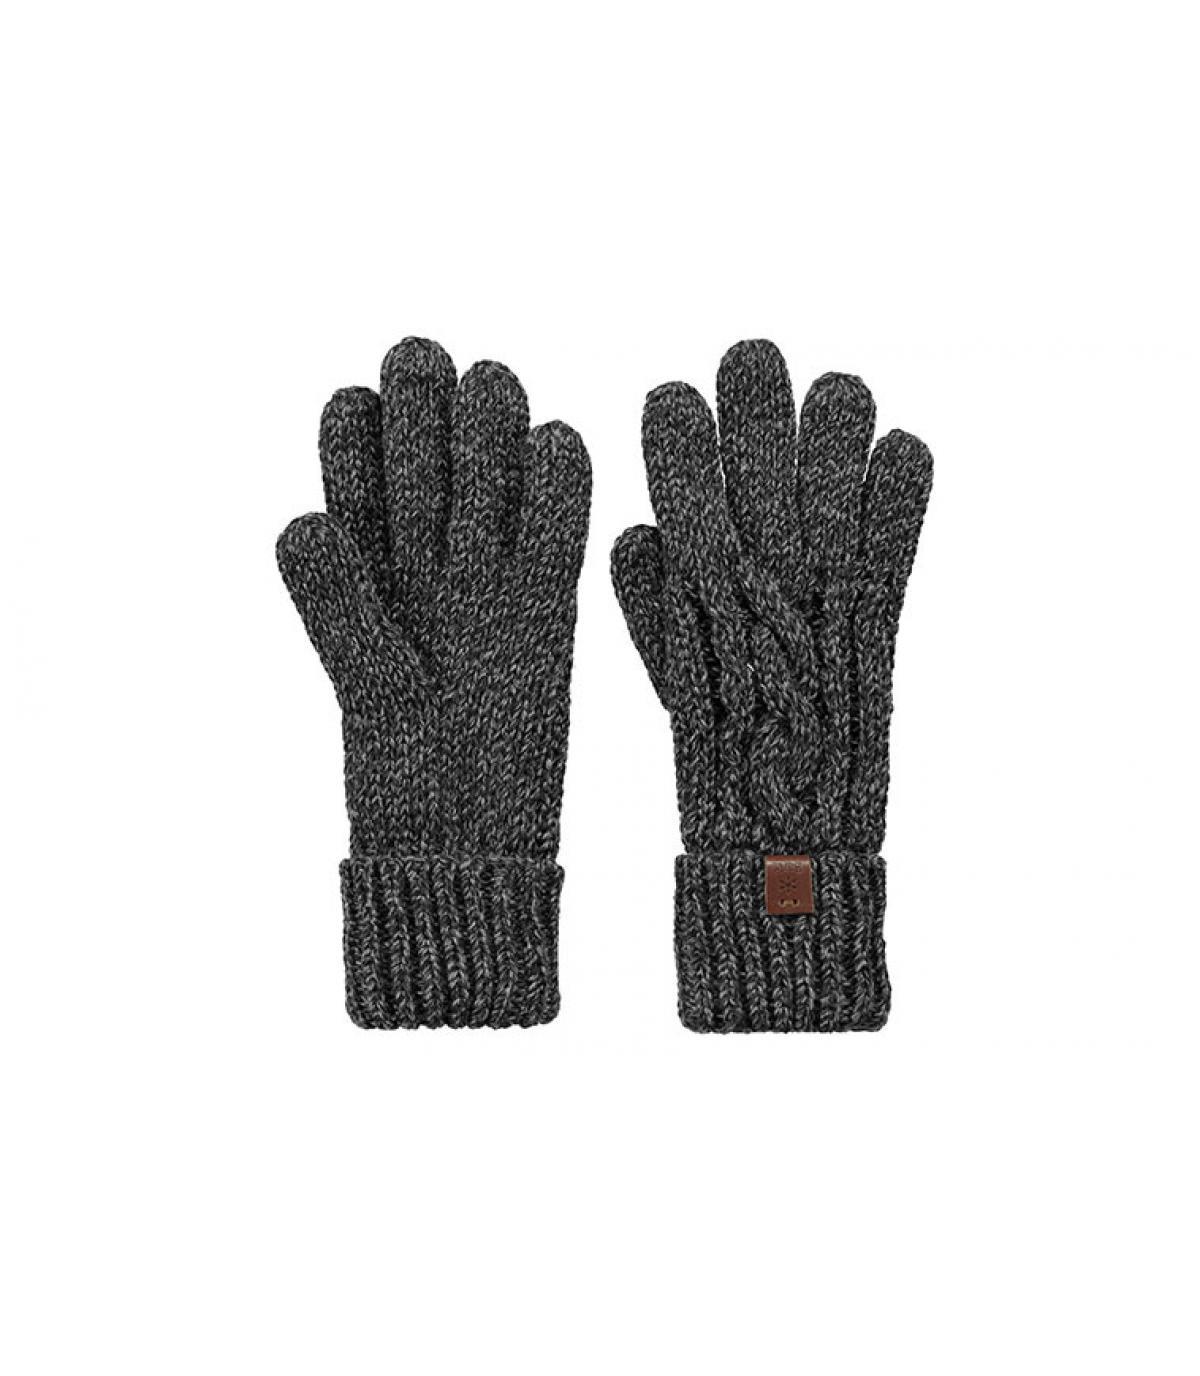 Détails Twister Gloves black - image 2